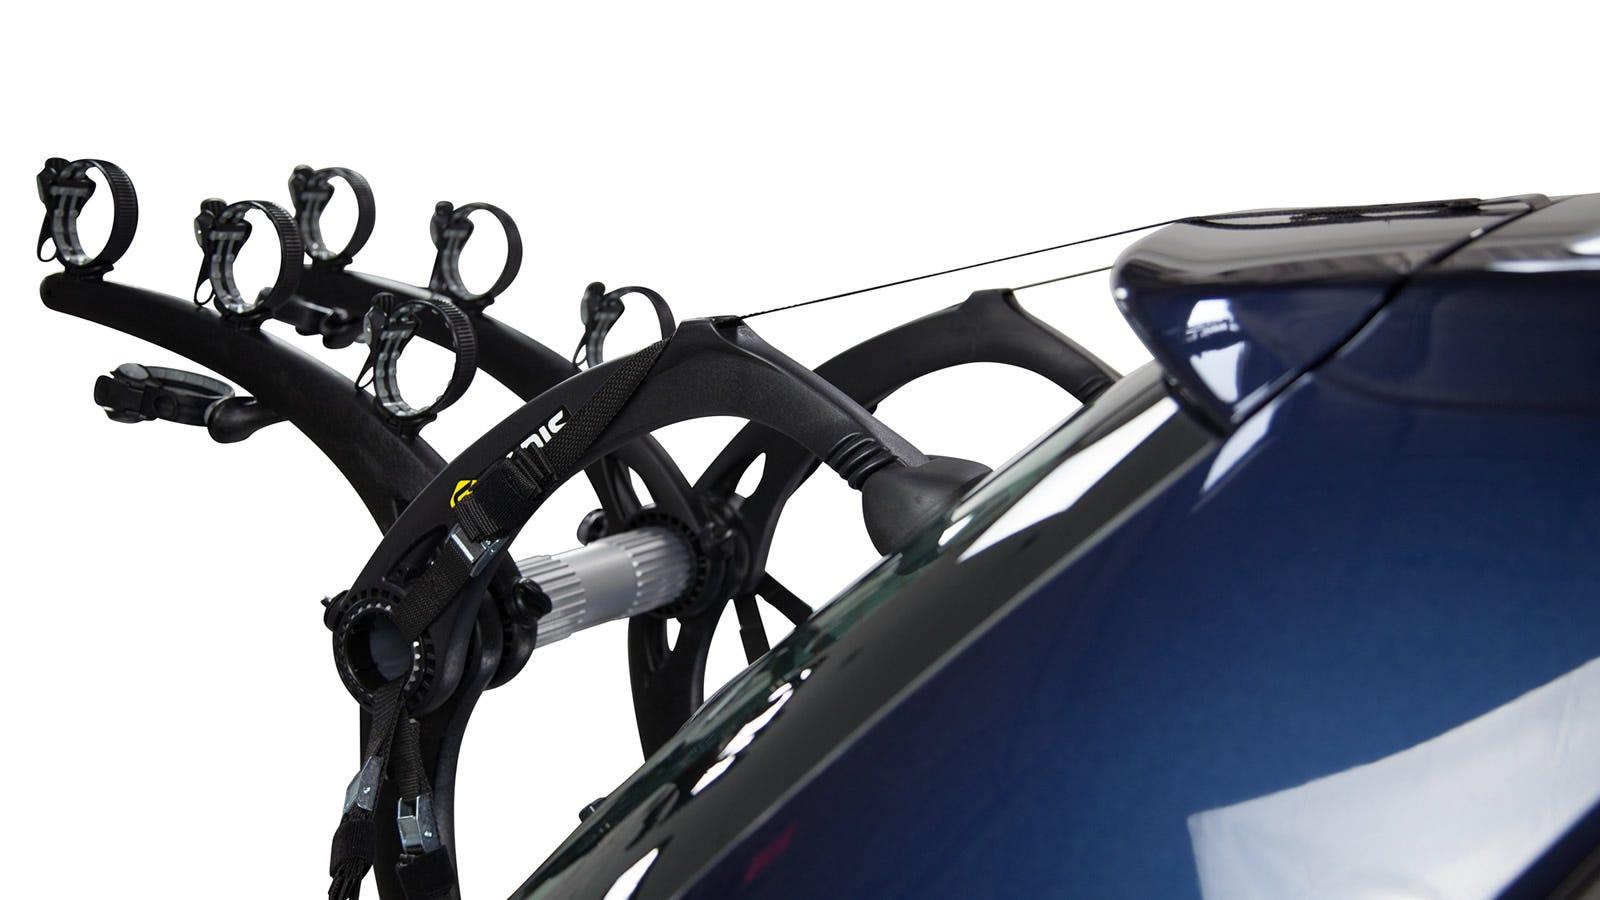 Saris trunk mount bike rack